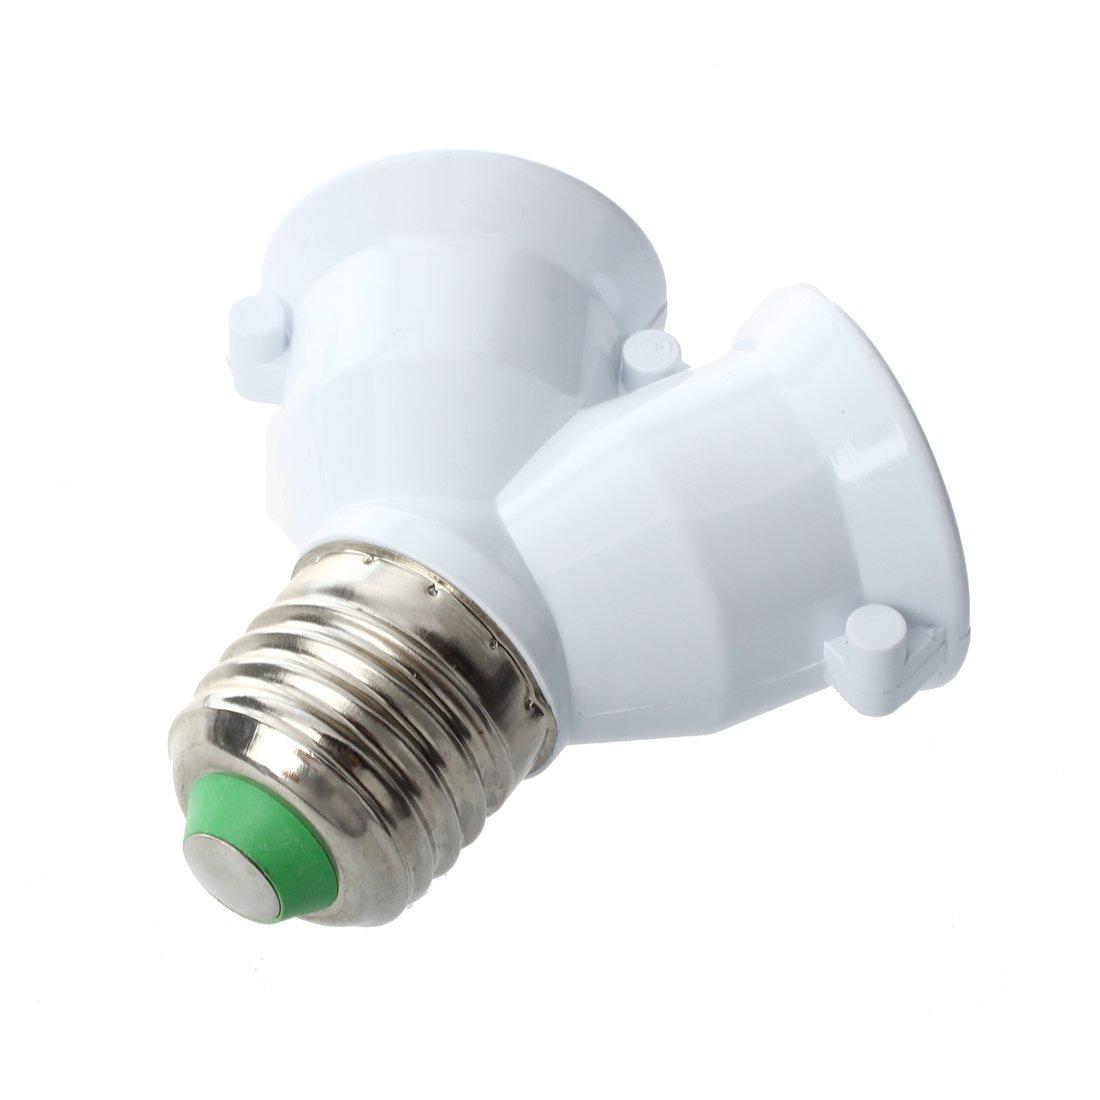 5 x Doppellampen Adapter LED-Lampe E27 Fassungen TOOGOO R